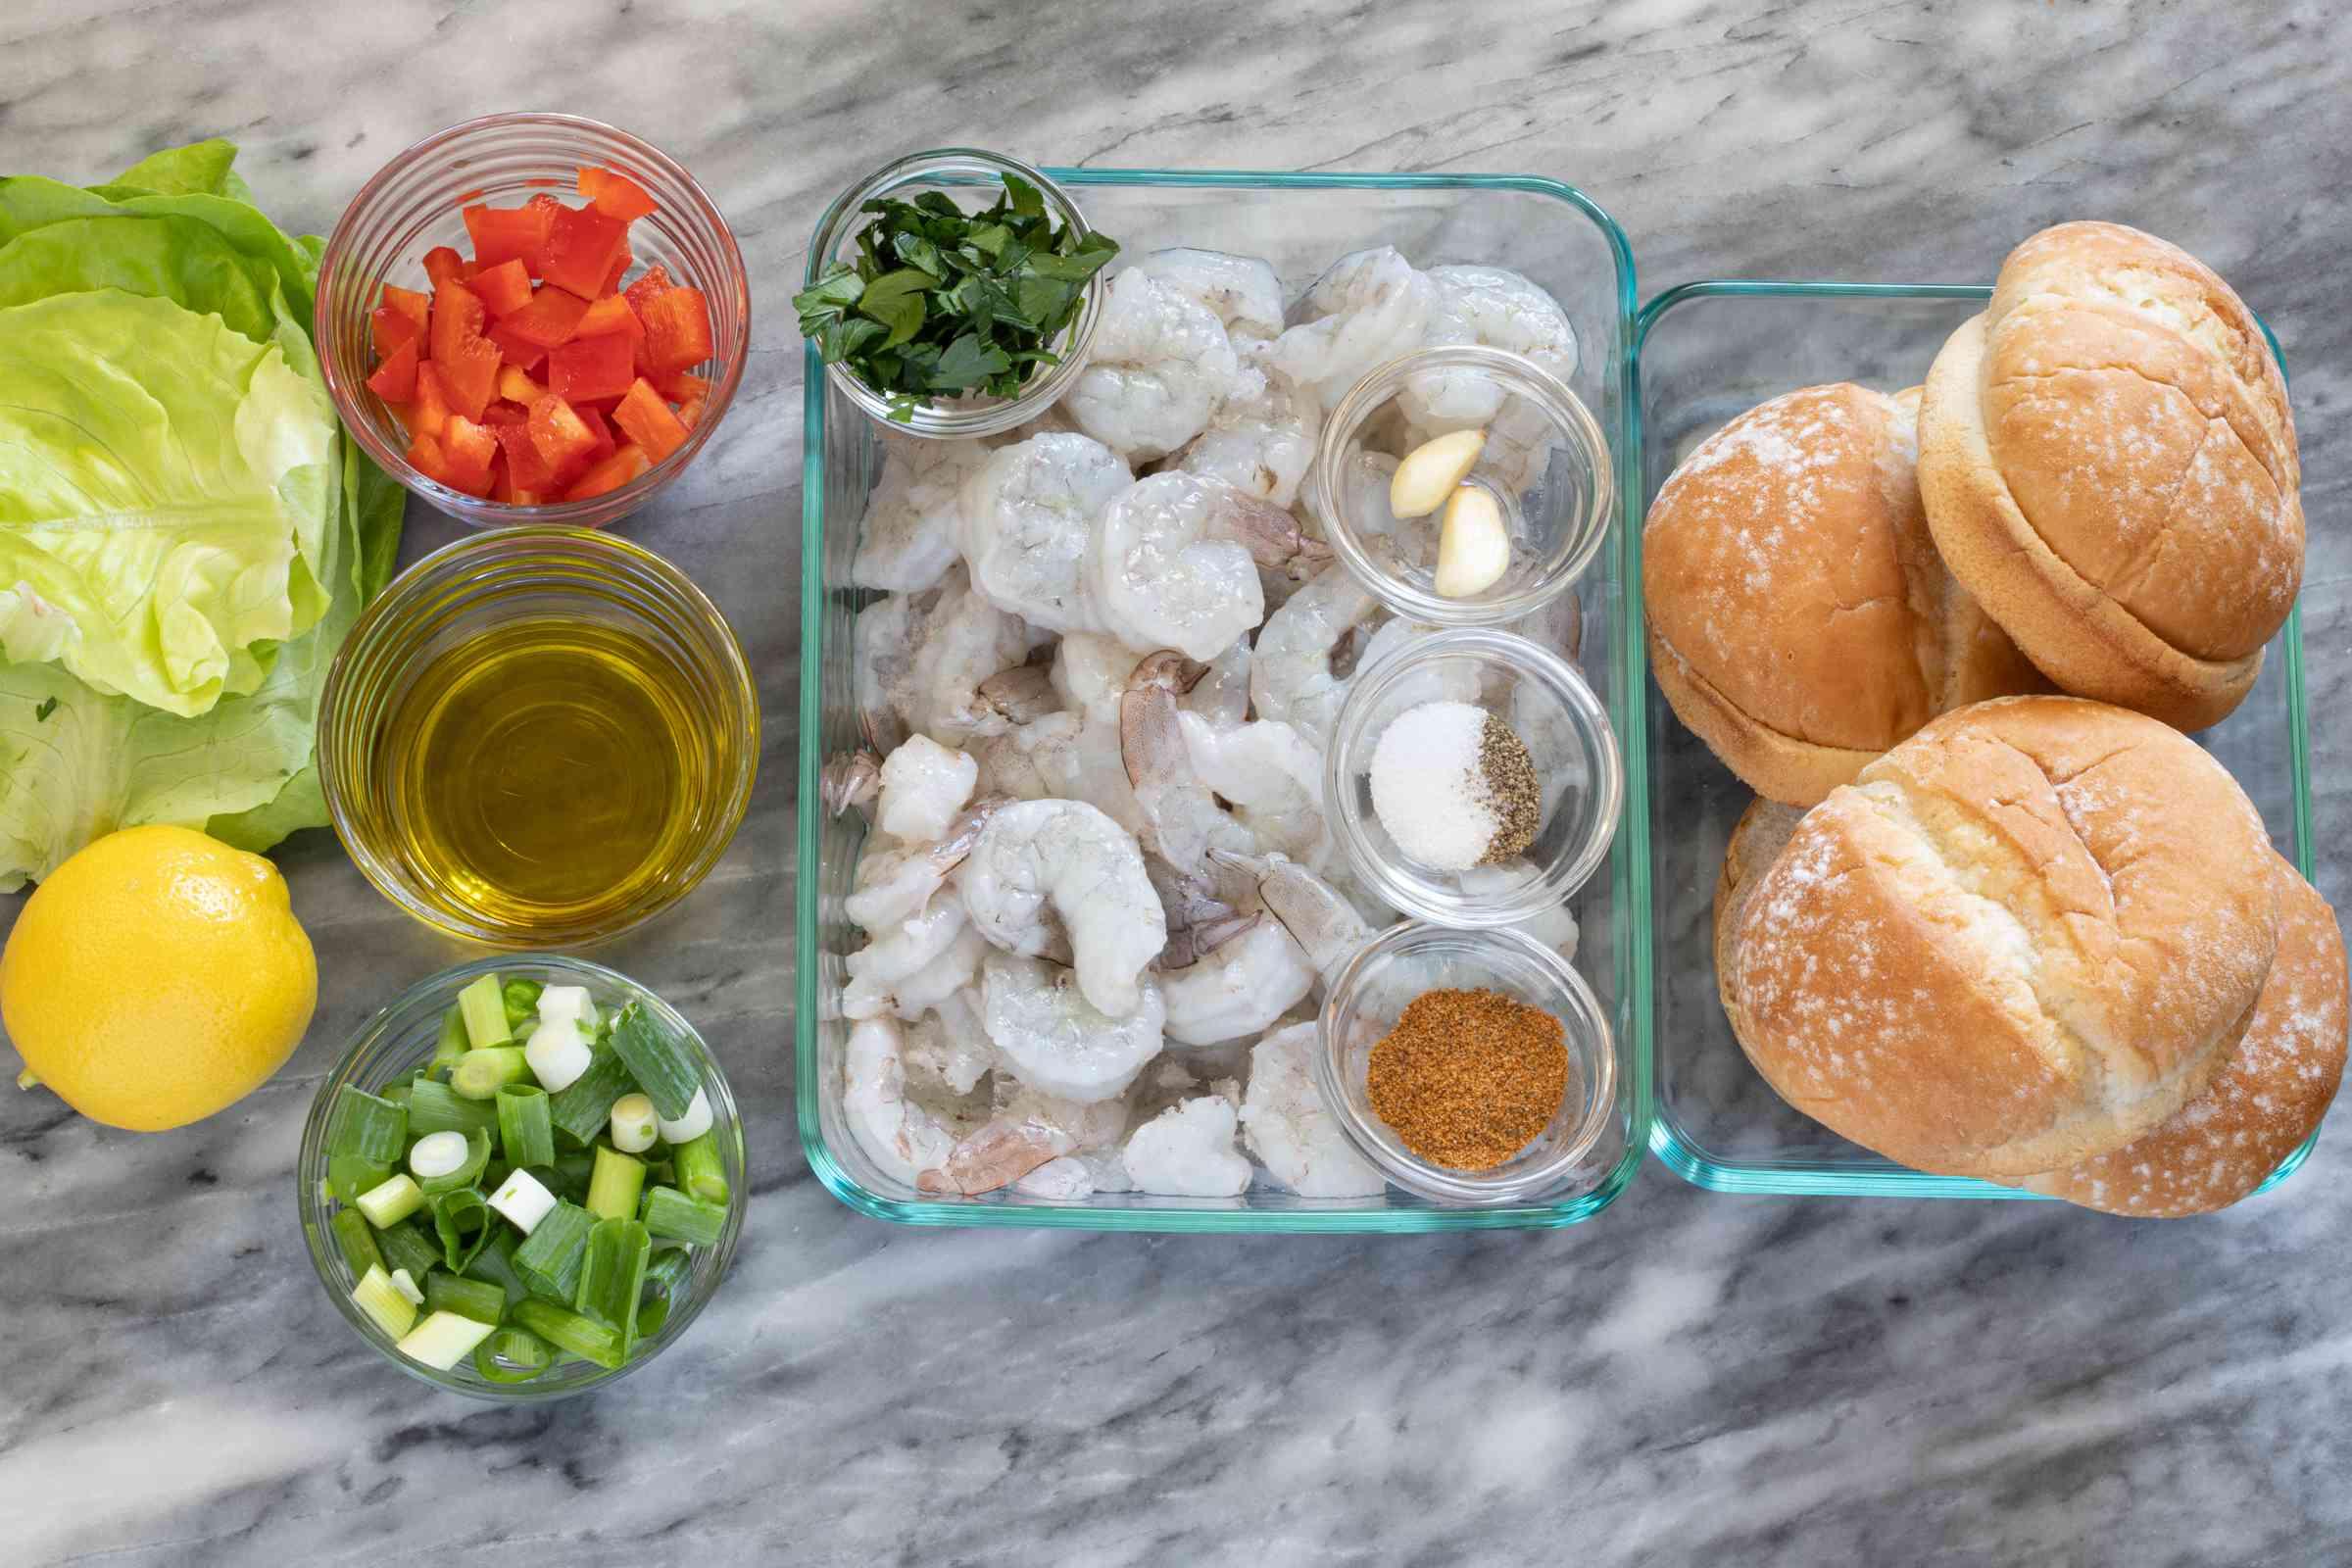 Ingredients for shrimp burgers.